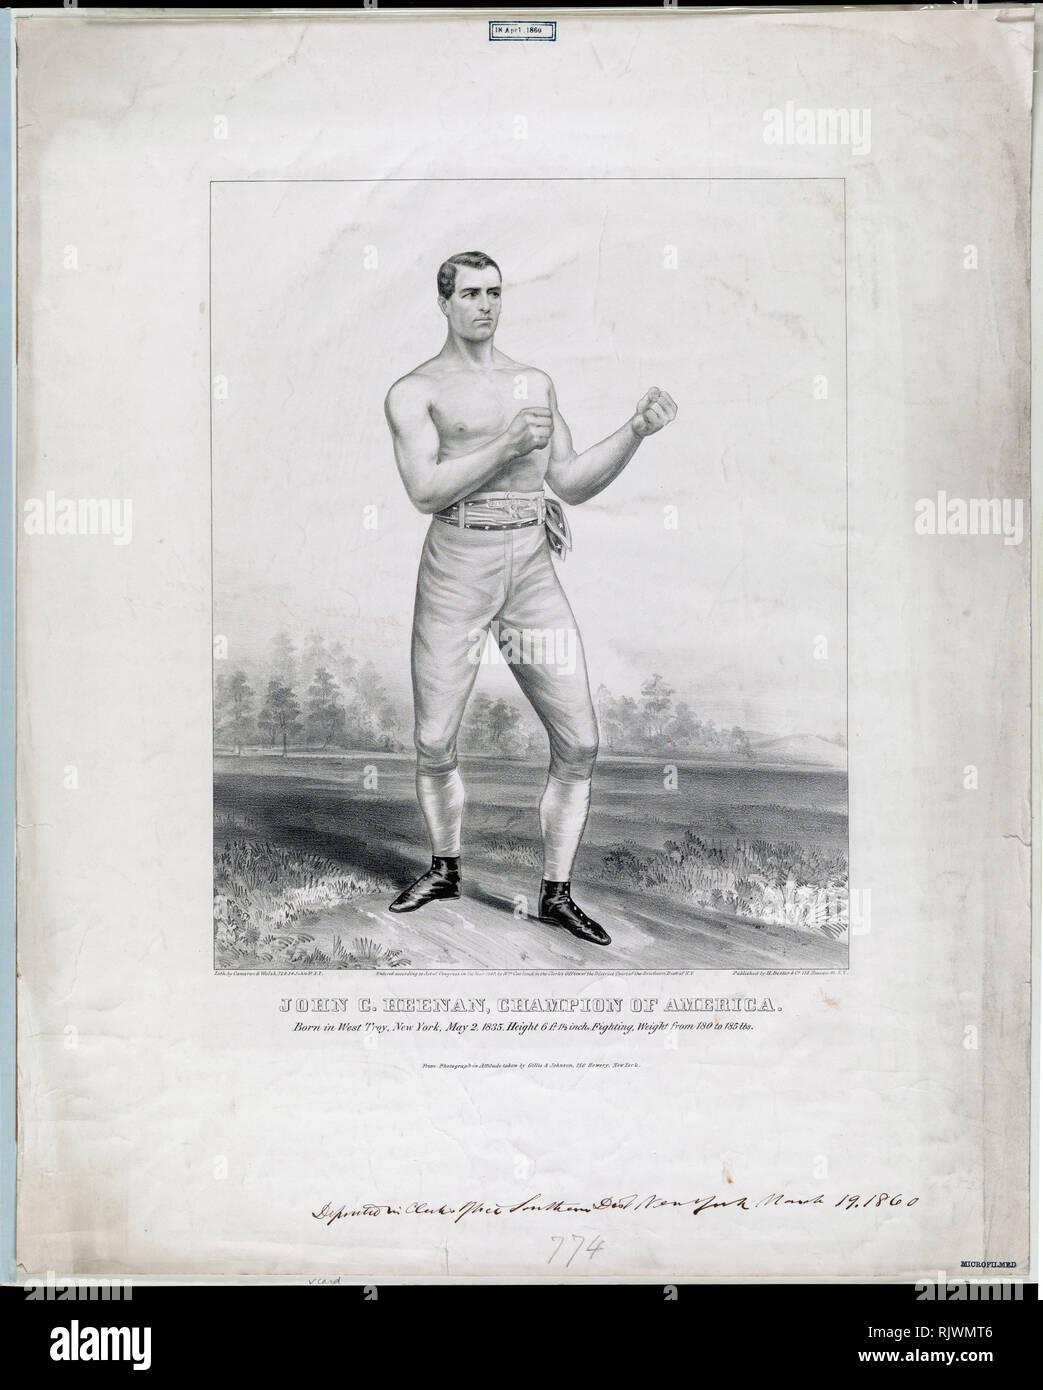 Print shows a full-length portrait of John Carmel Heenan, in boxing stance ca. 1860s - Stock Image